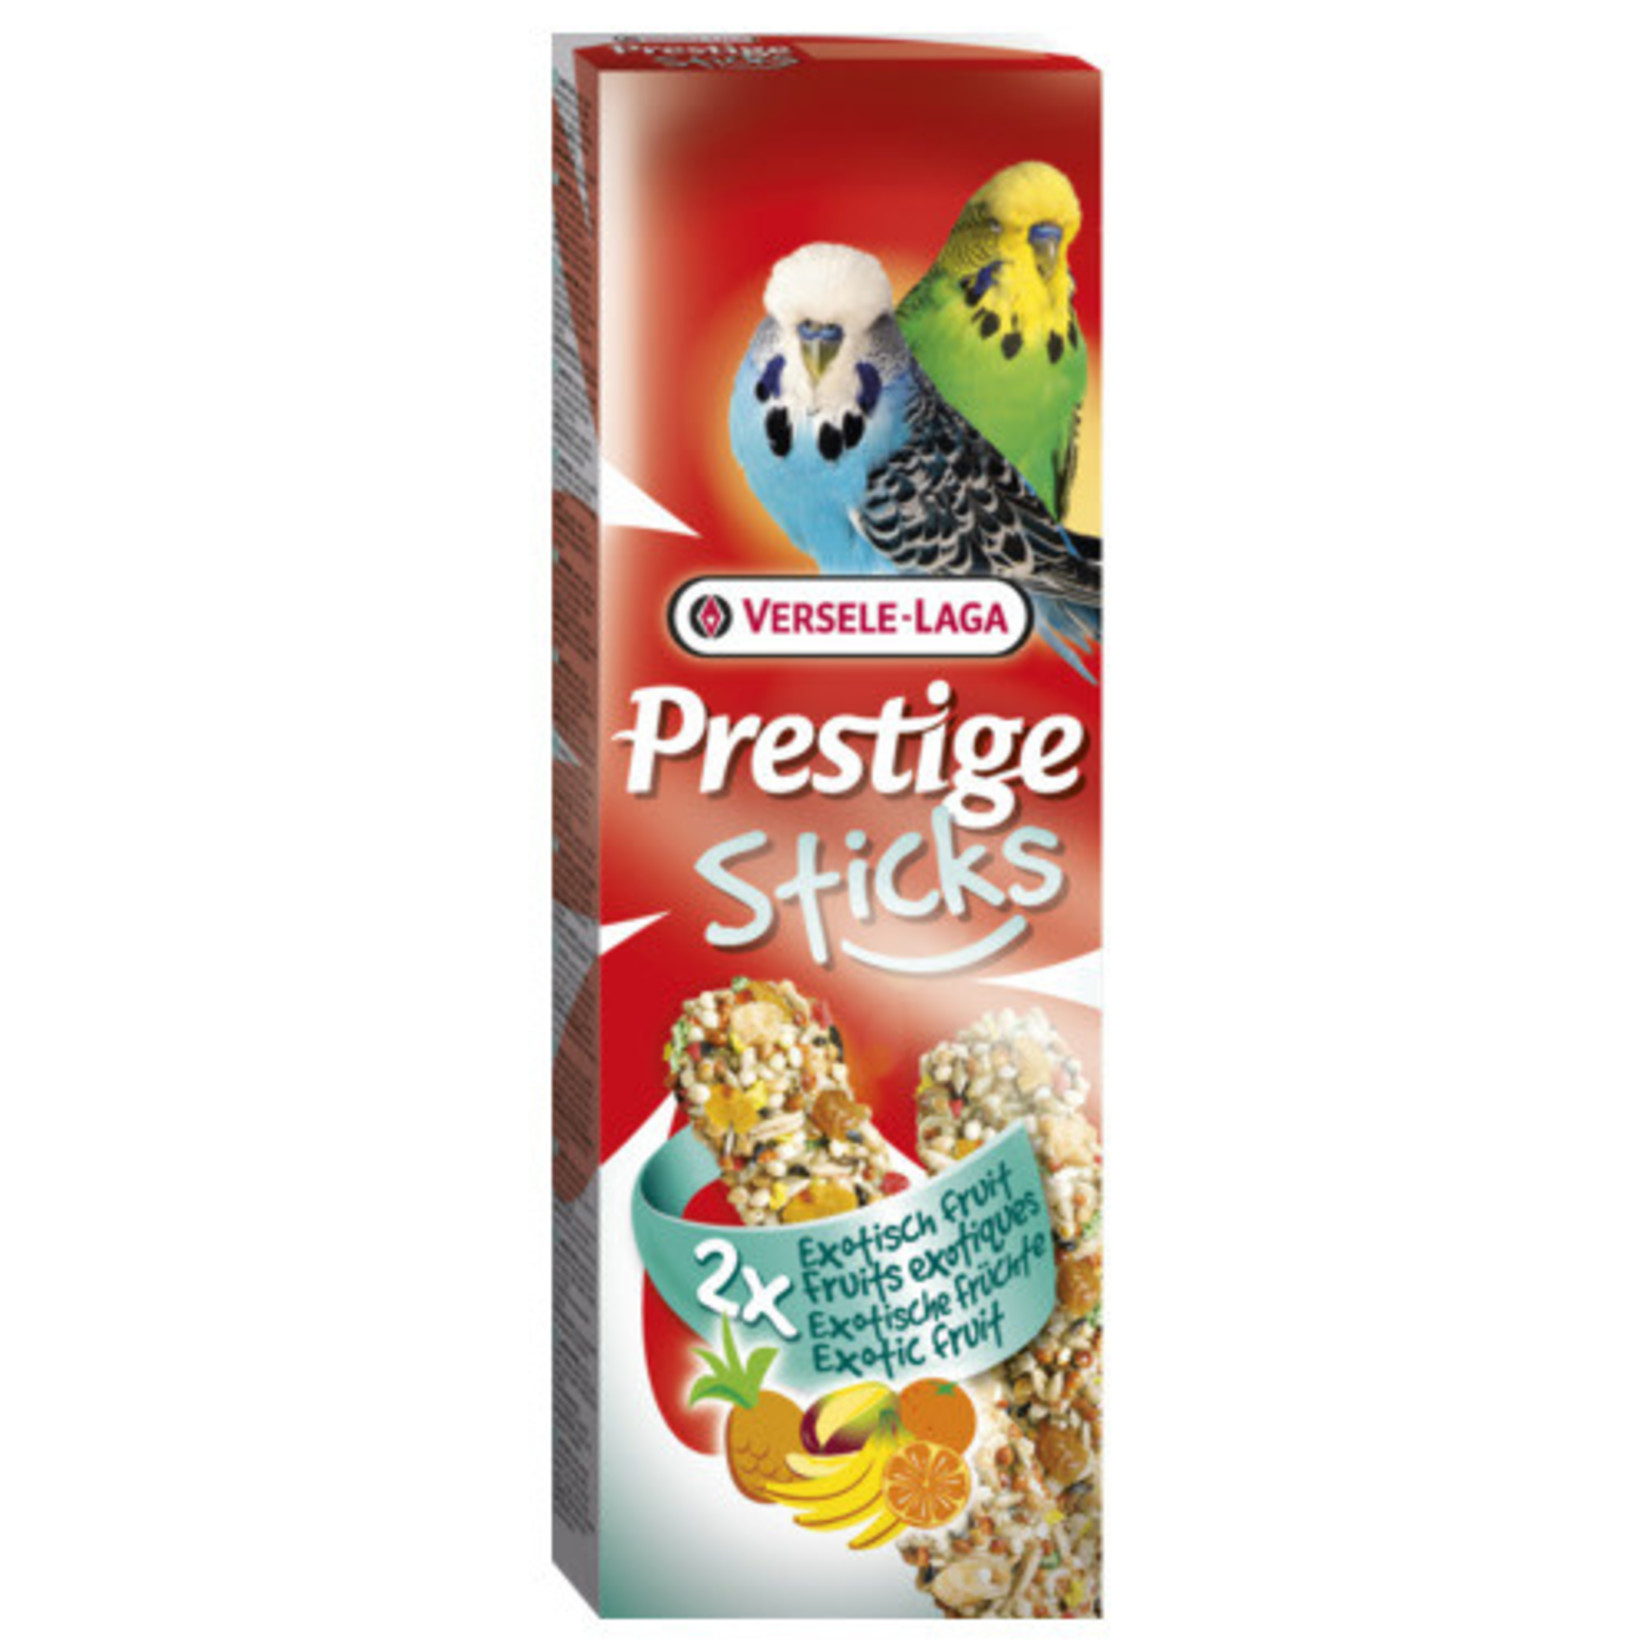 Versele-Laga Prestige Sticks Parkiet Exotic